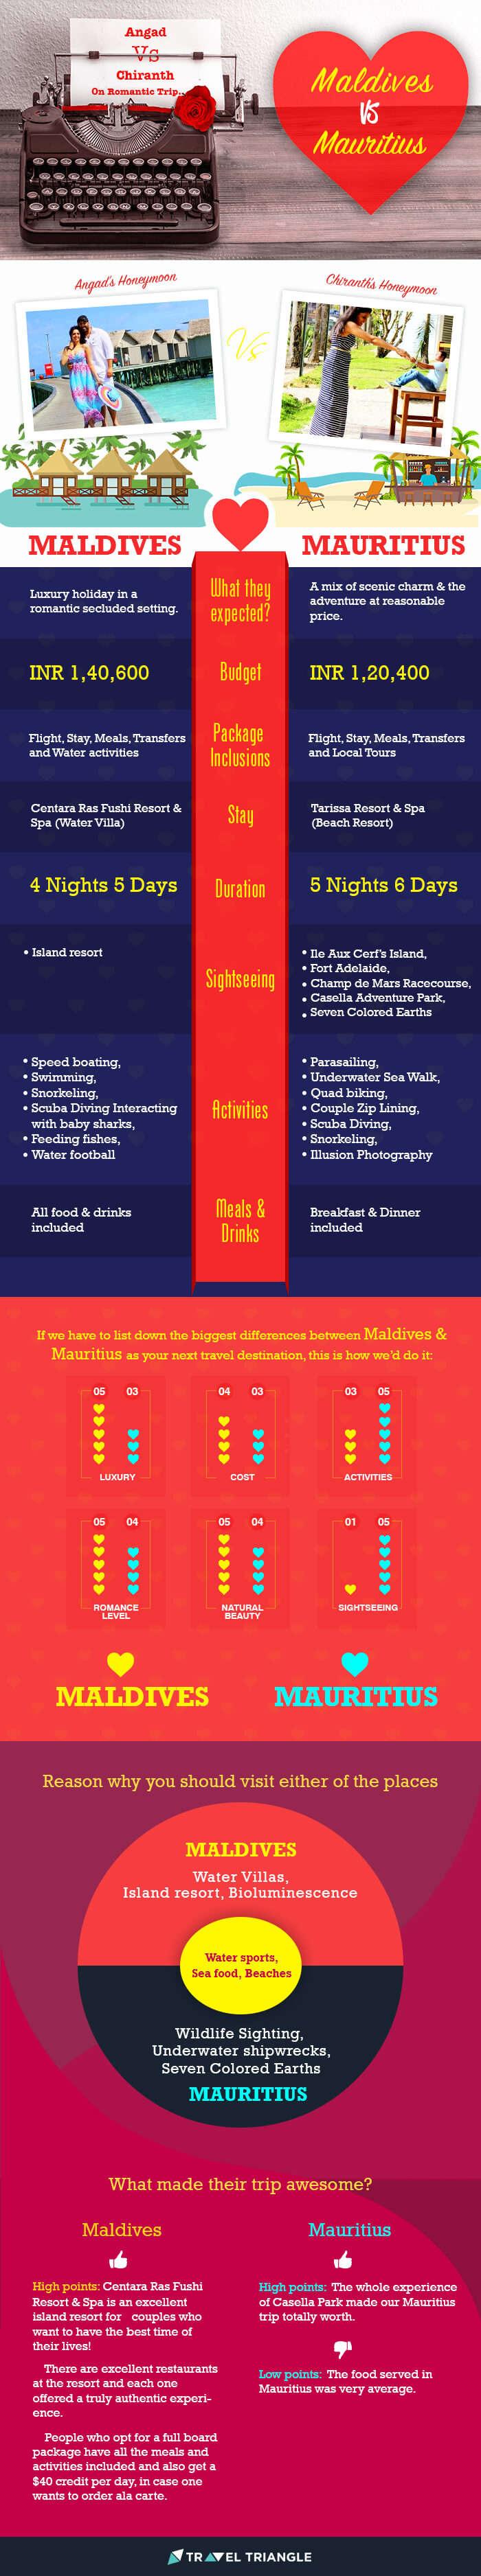 Maldives-VS-Mauritius_1B